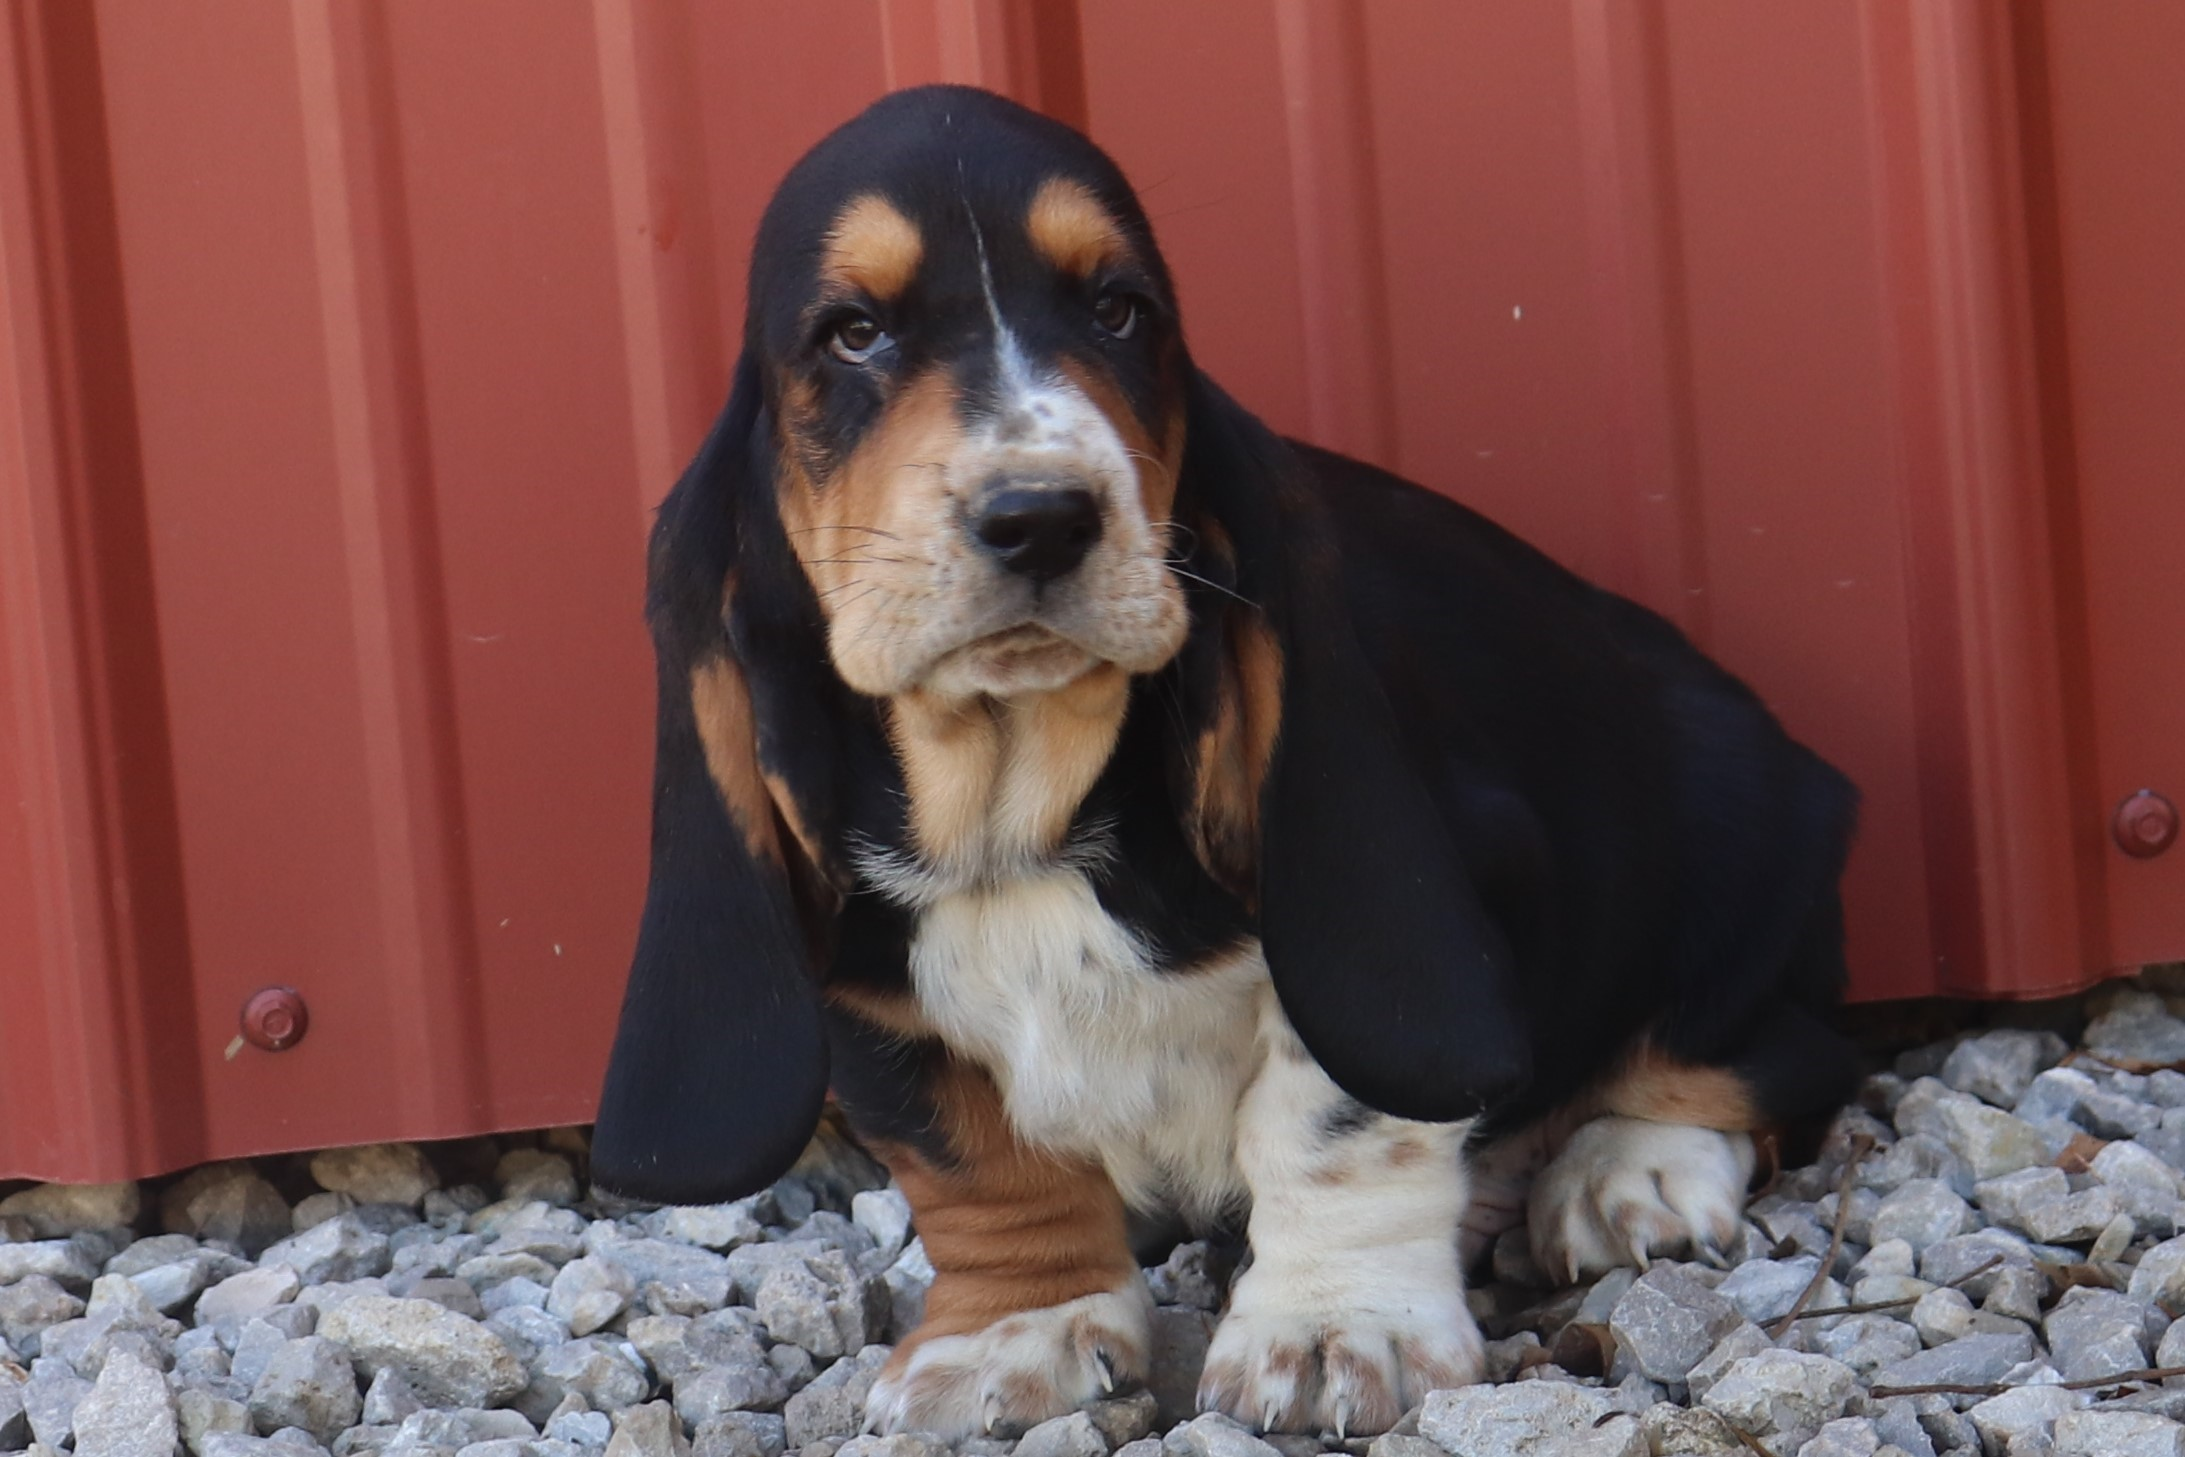 Basset Hound Puppies for sale in Missouri — Long Range Ranch Corgi